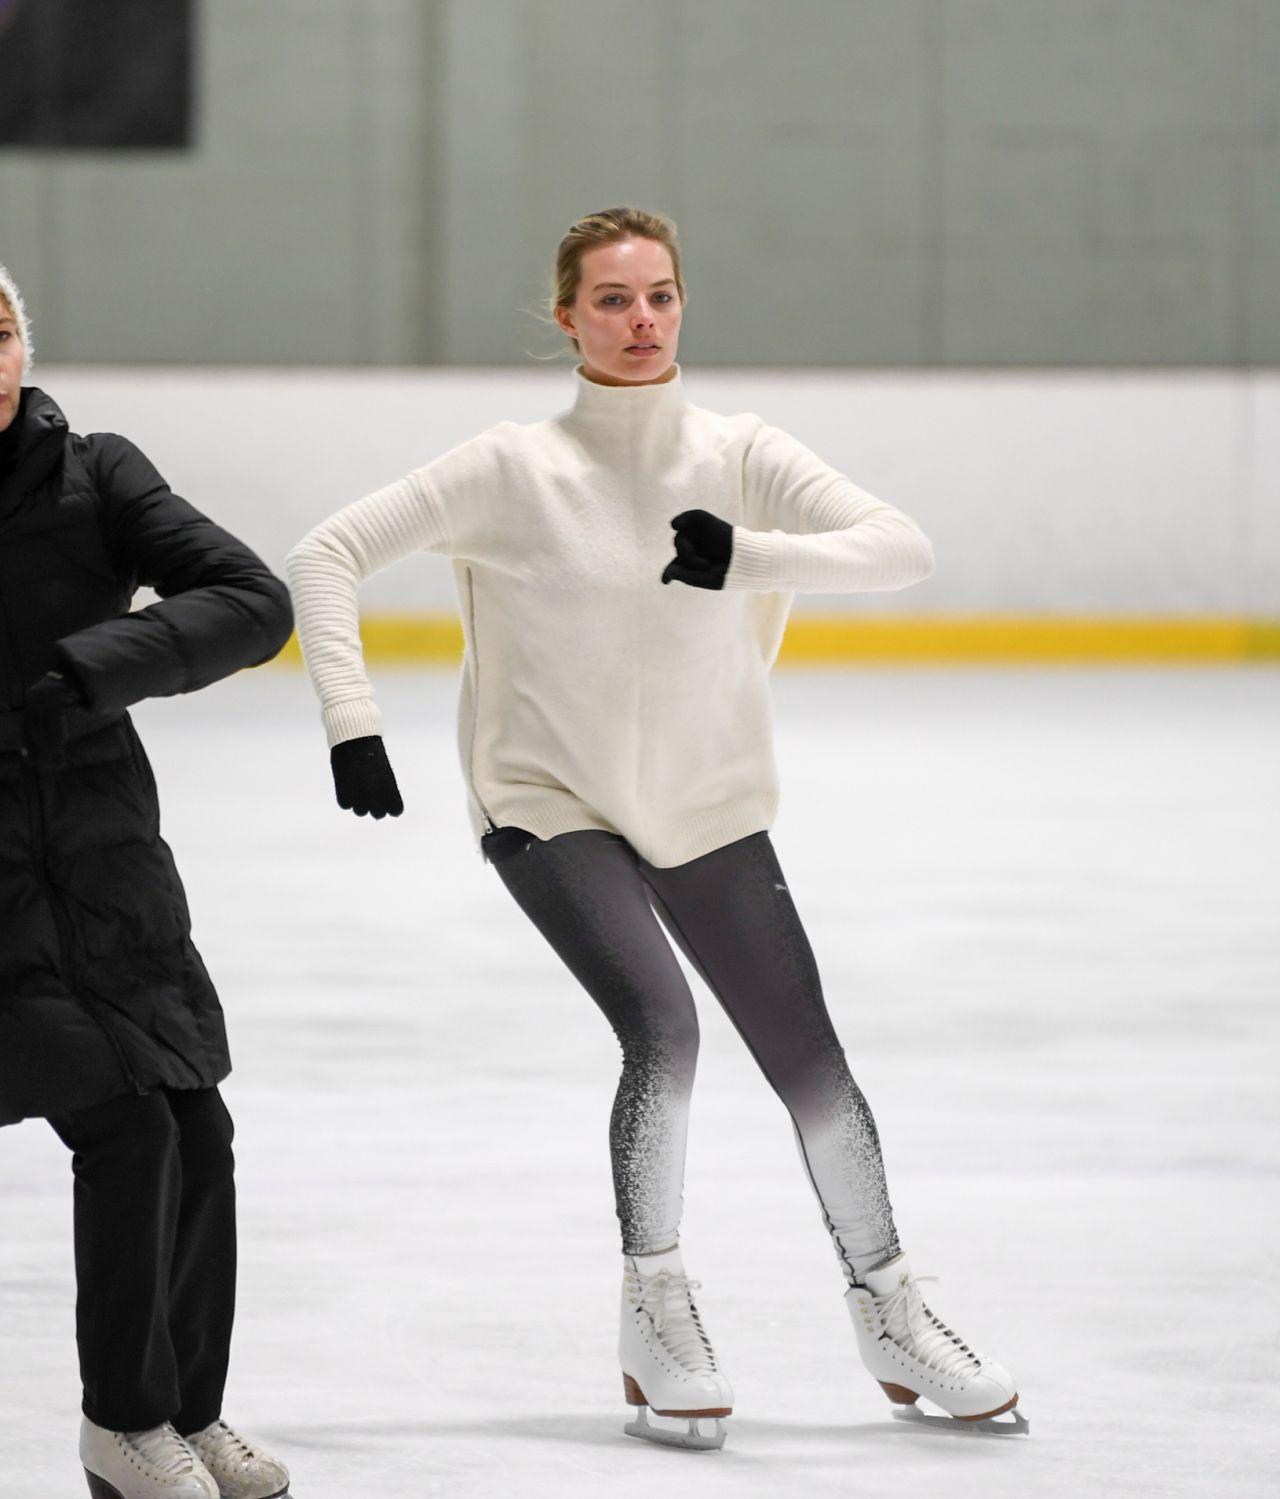 Margot Robbie Skating In The States After Secret Wedding